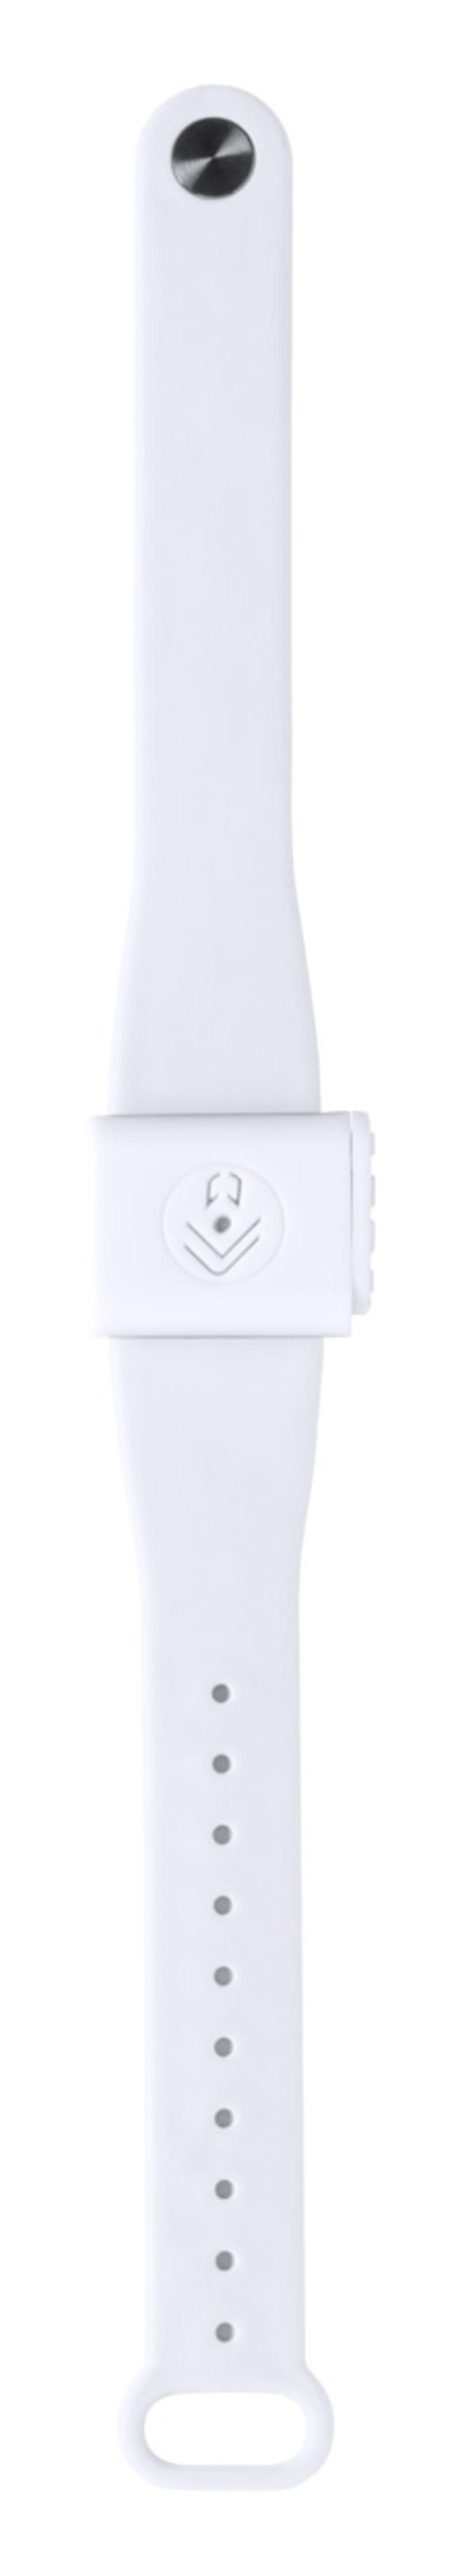 Telfin mosquito repellent bracelet